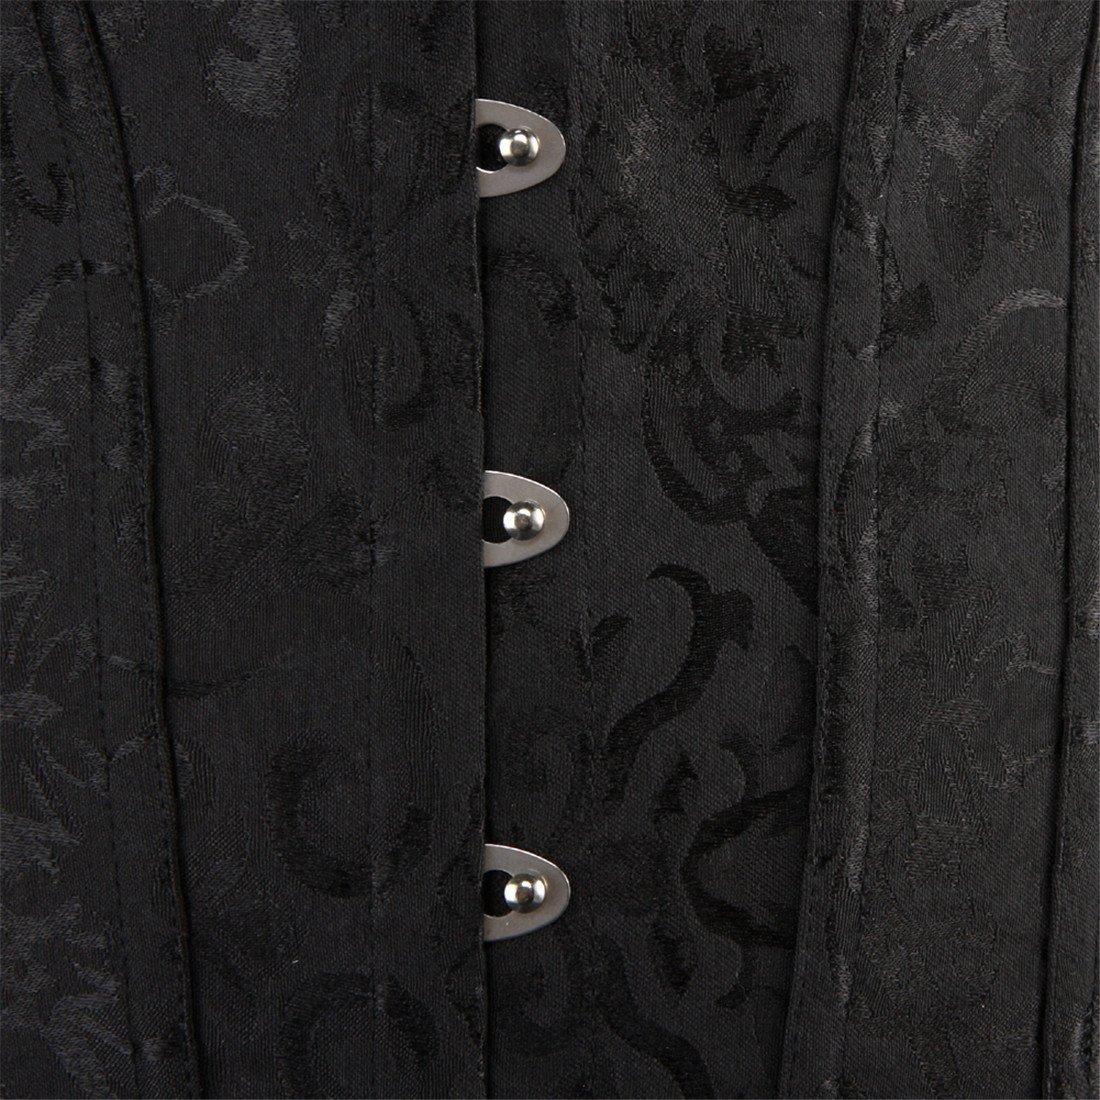 Women Lace Boned Corset Lingerie for Waist training Bustier Clubwear Plus Size 3